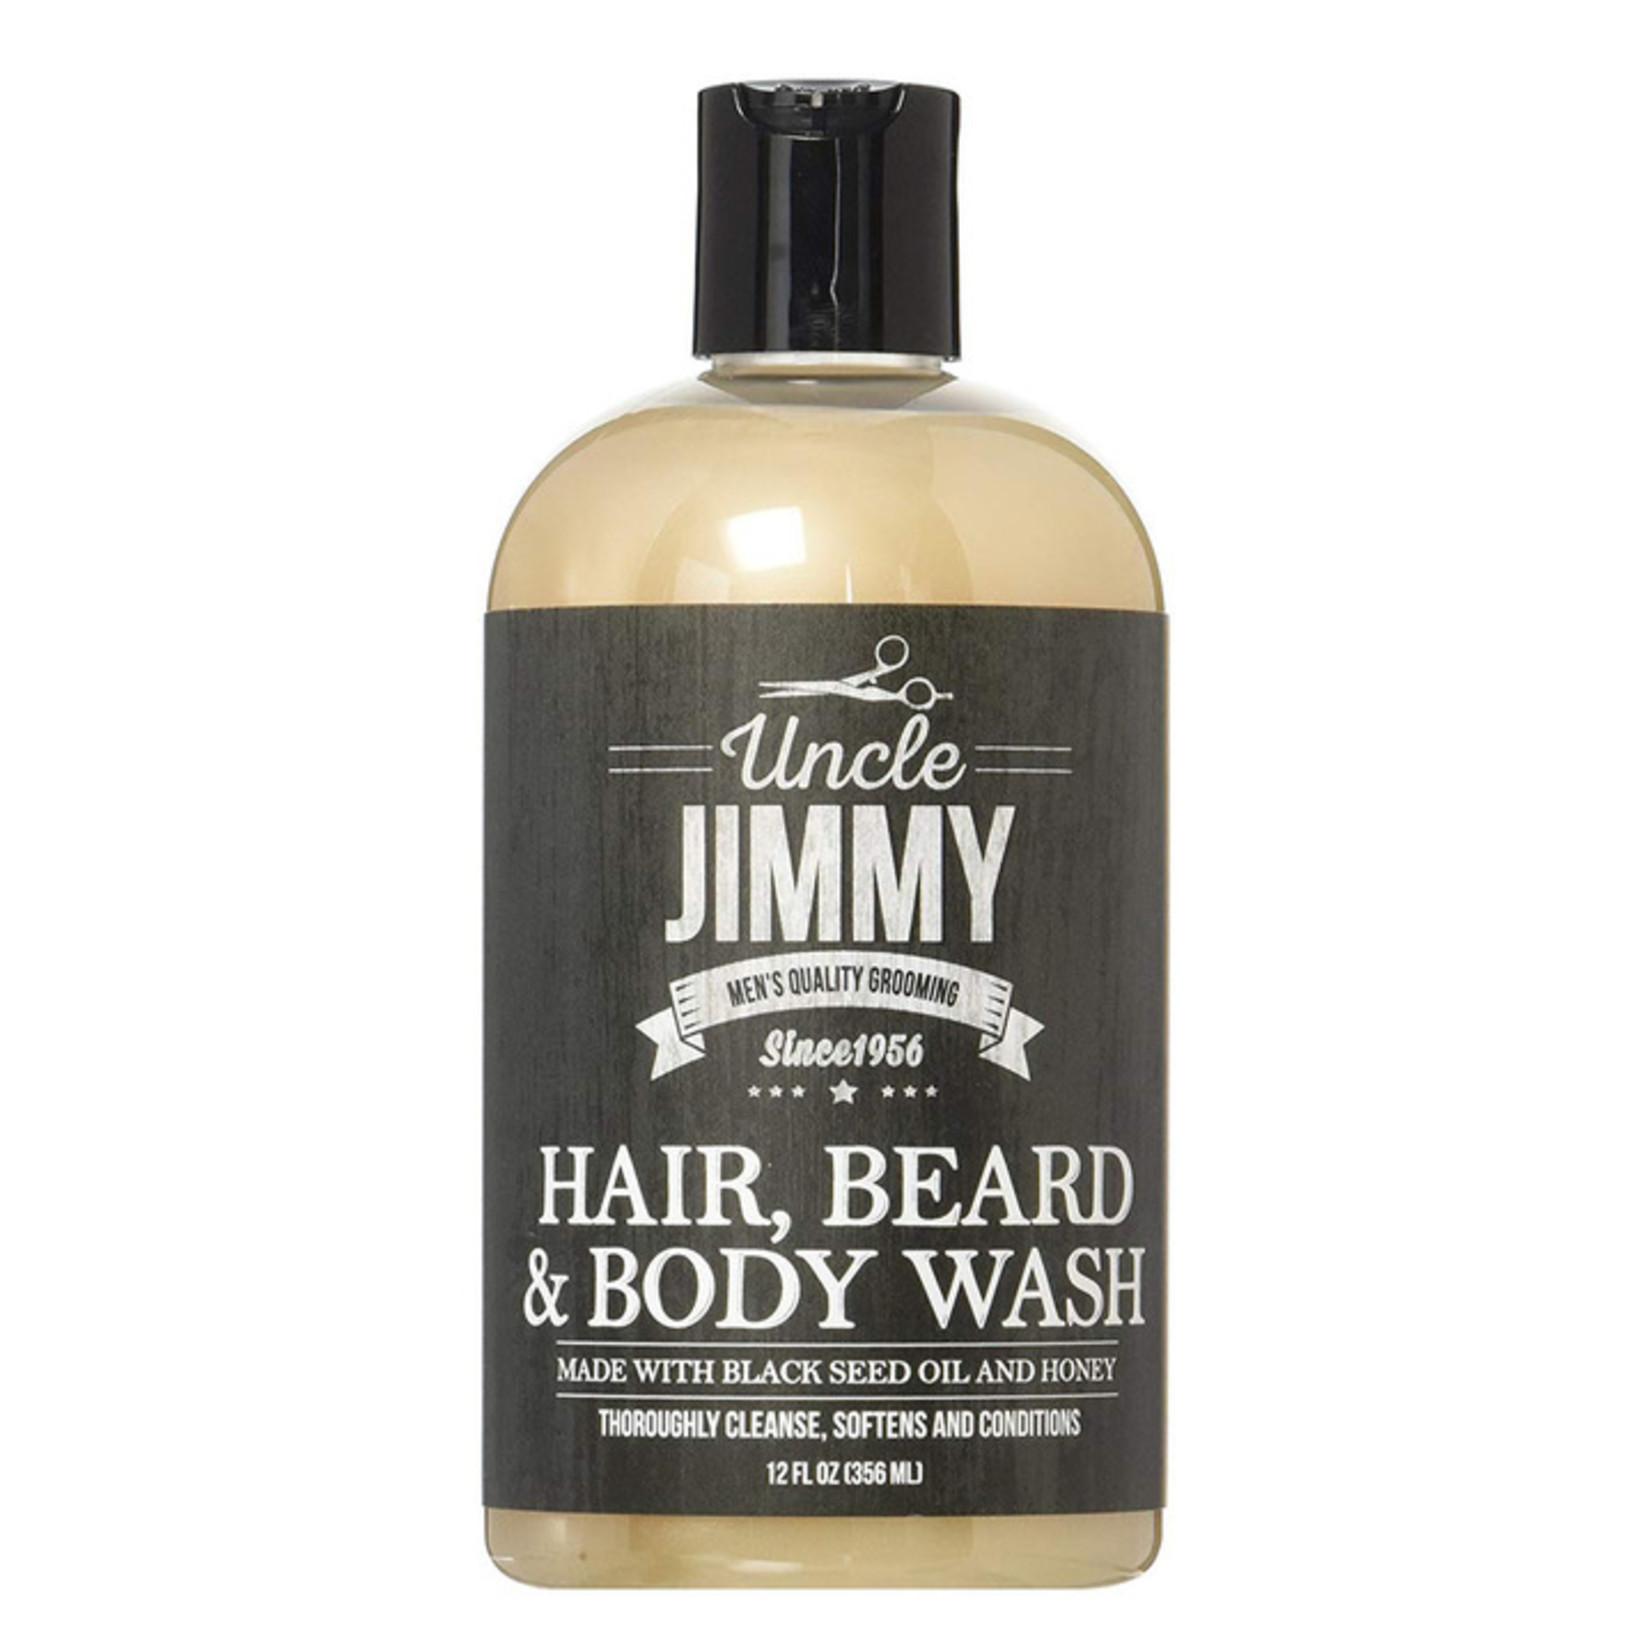 UNCLE JIMMY UNCLE JIMMY HAIR, BEARD & BODY WASH